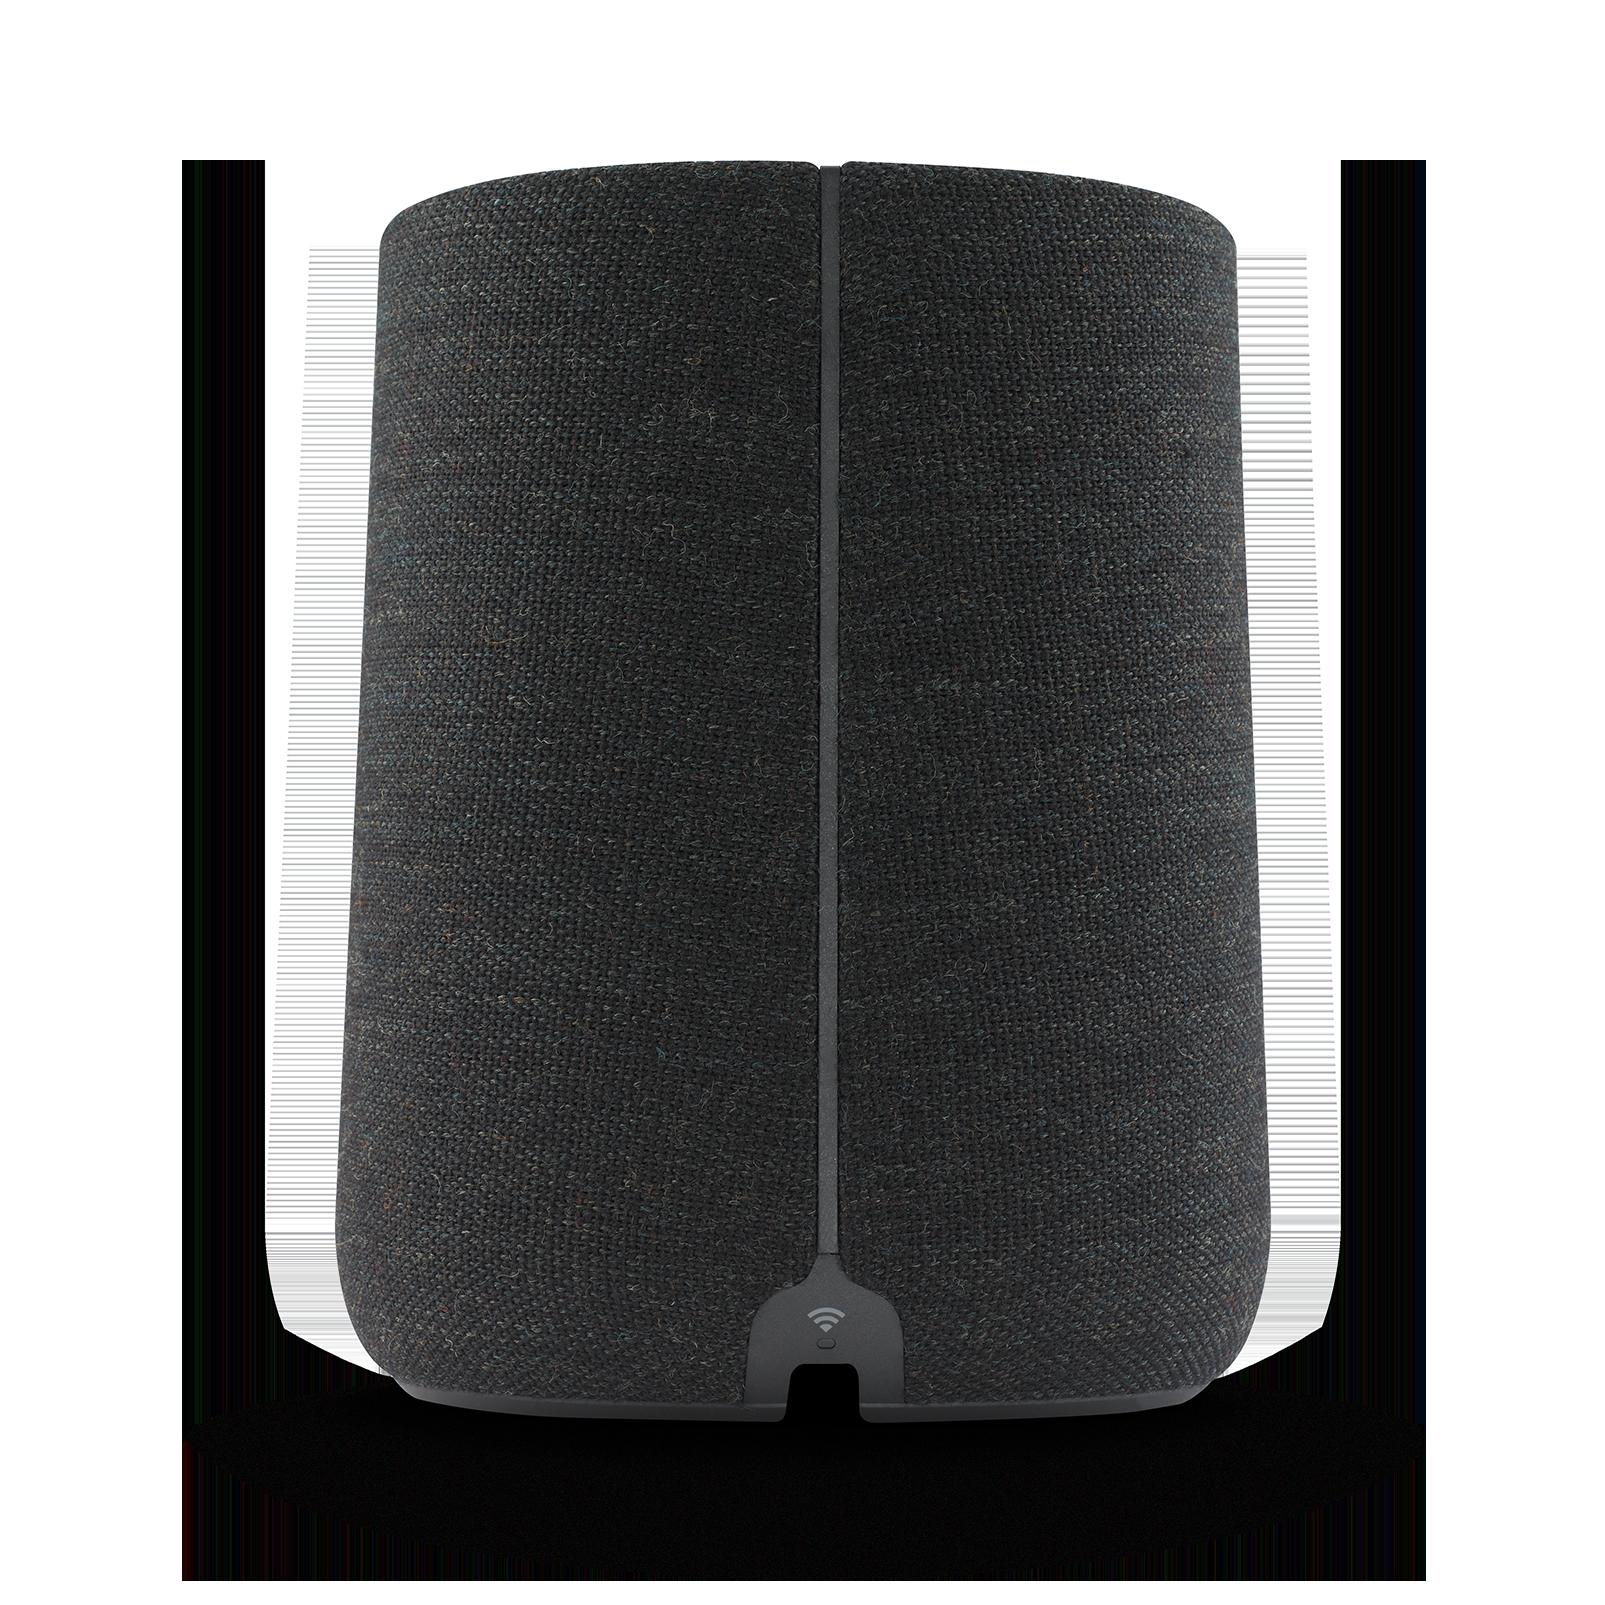 Harman Kardon Citation ONE - Black - Compact, smart and amazing sound - Back